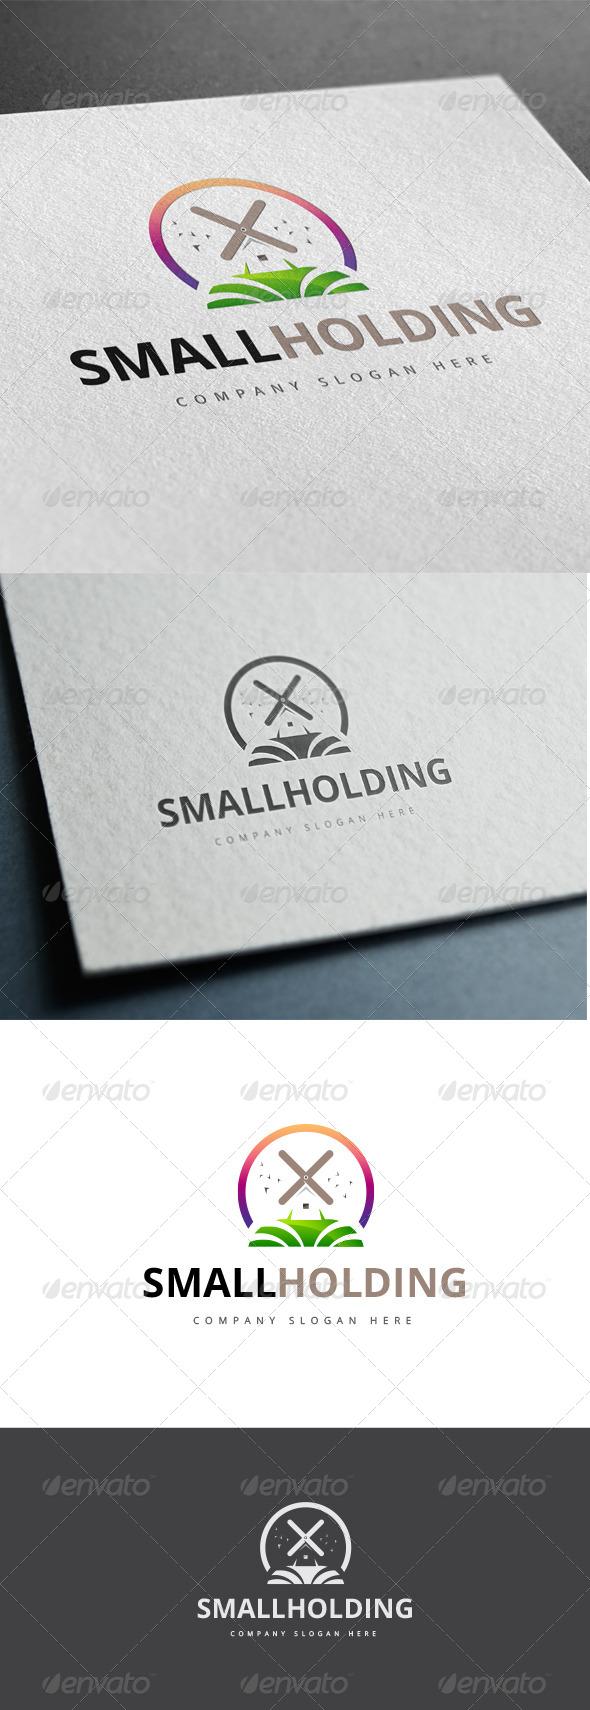 GraphicRiver Smallholding Logo 7791085